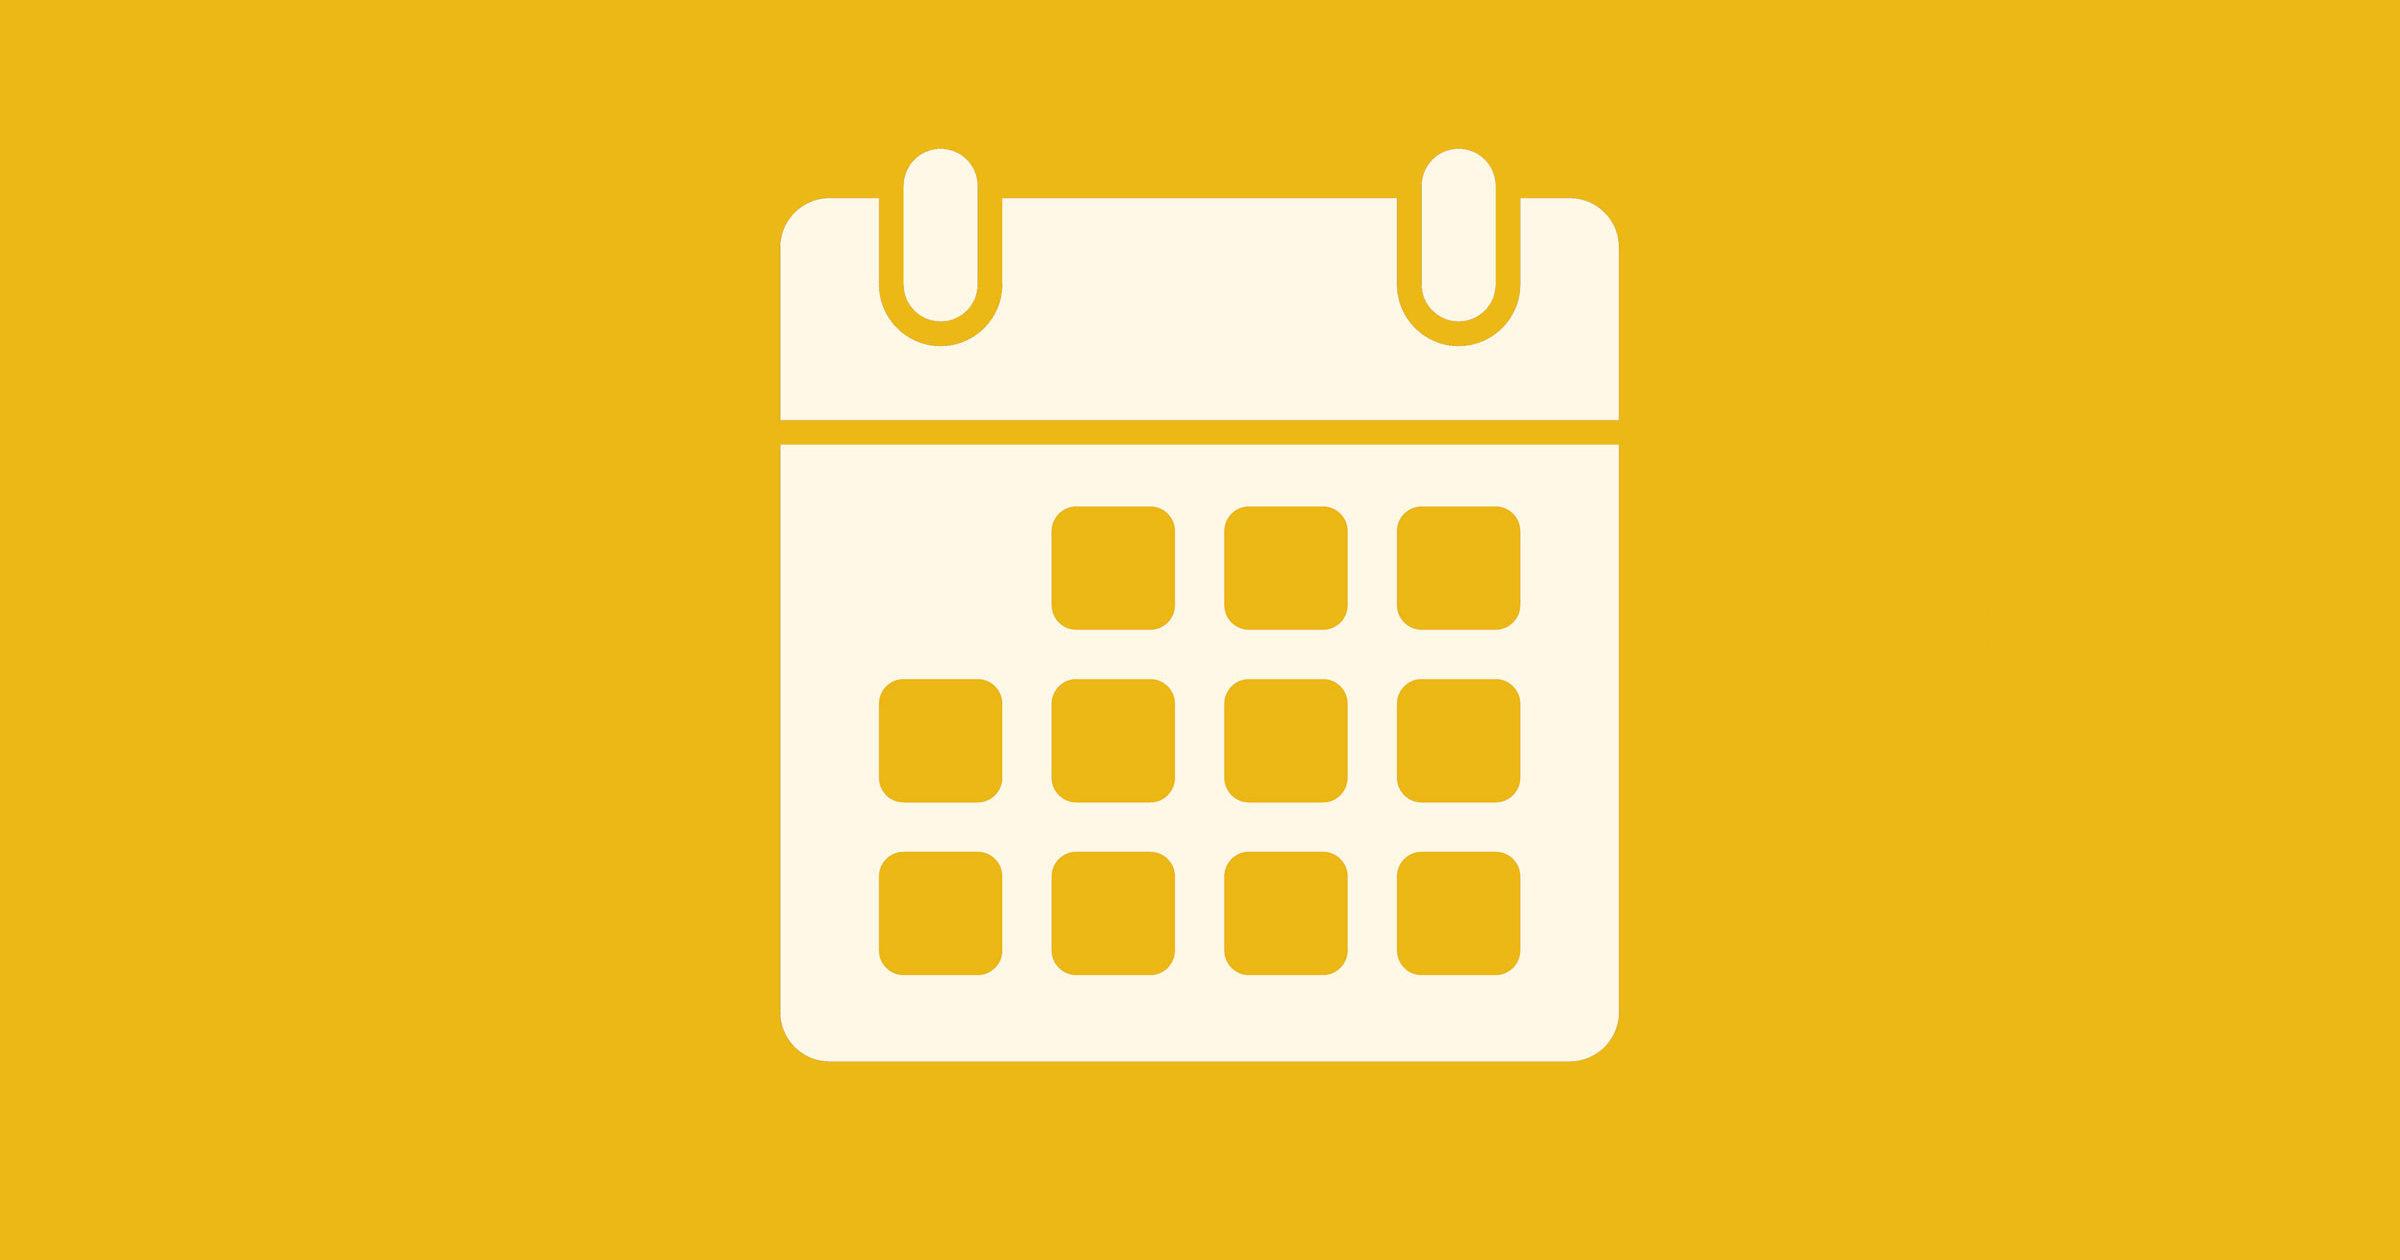 Black Lives Matter Monat 2019 – Kalender